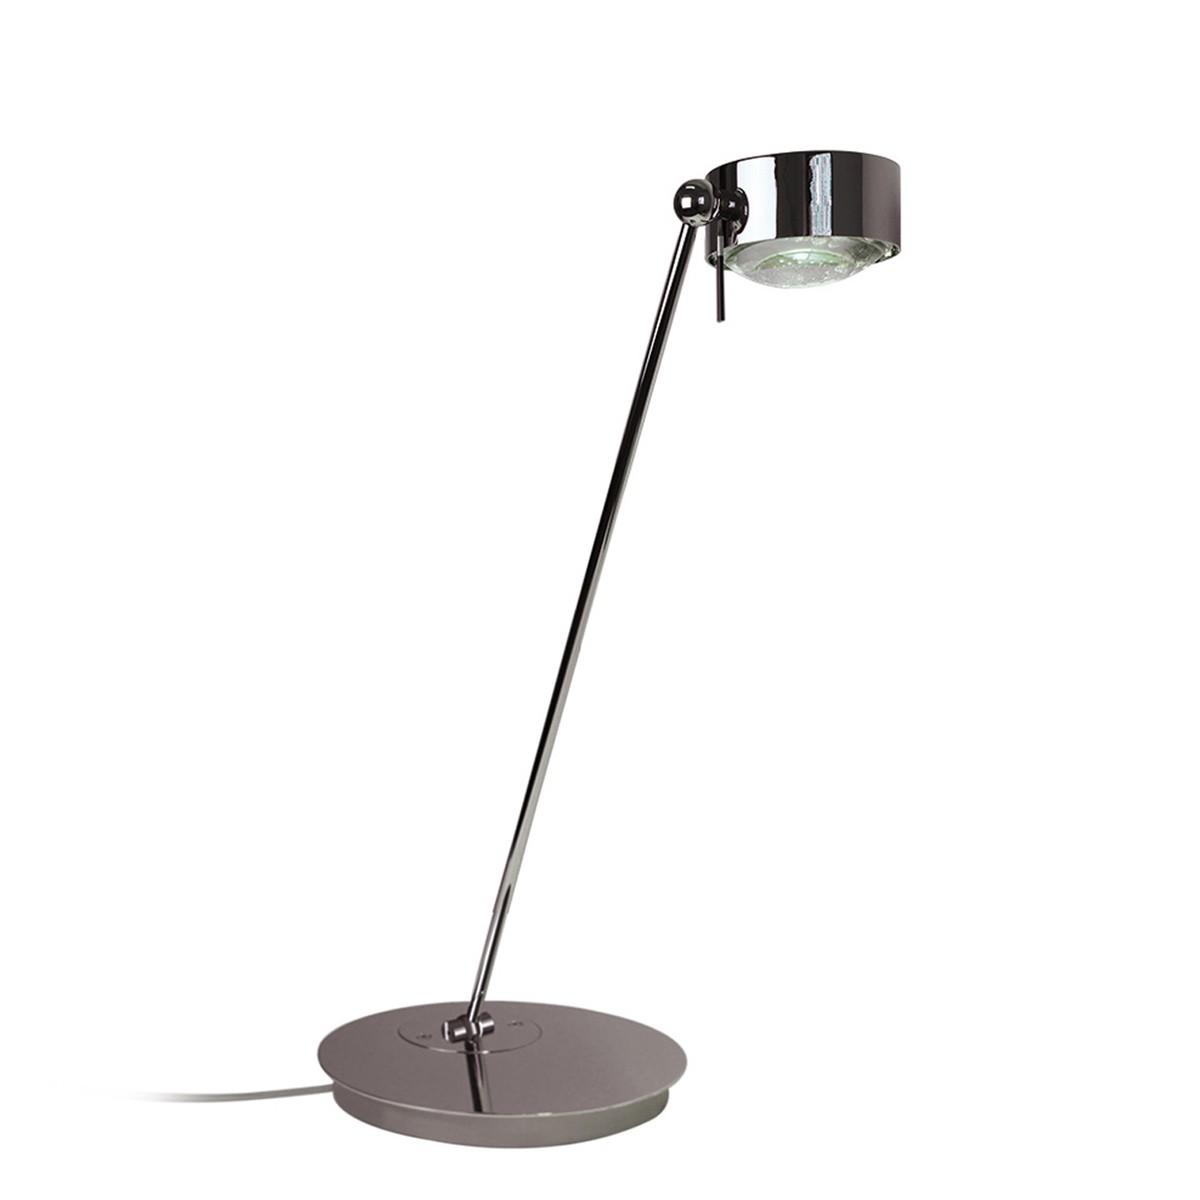 Top Light Puk Maxx Table Tischleuchte, 60 cm